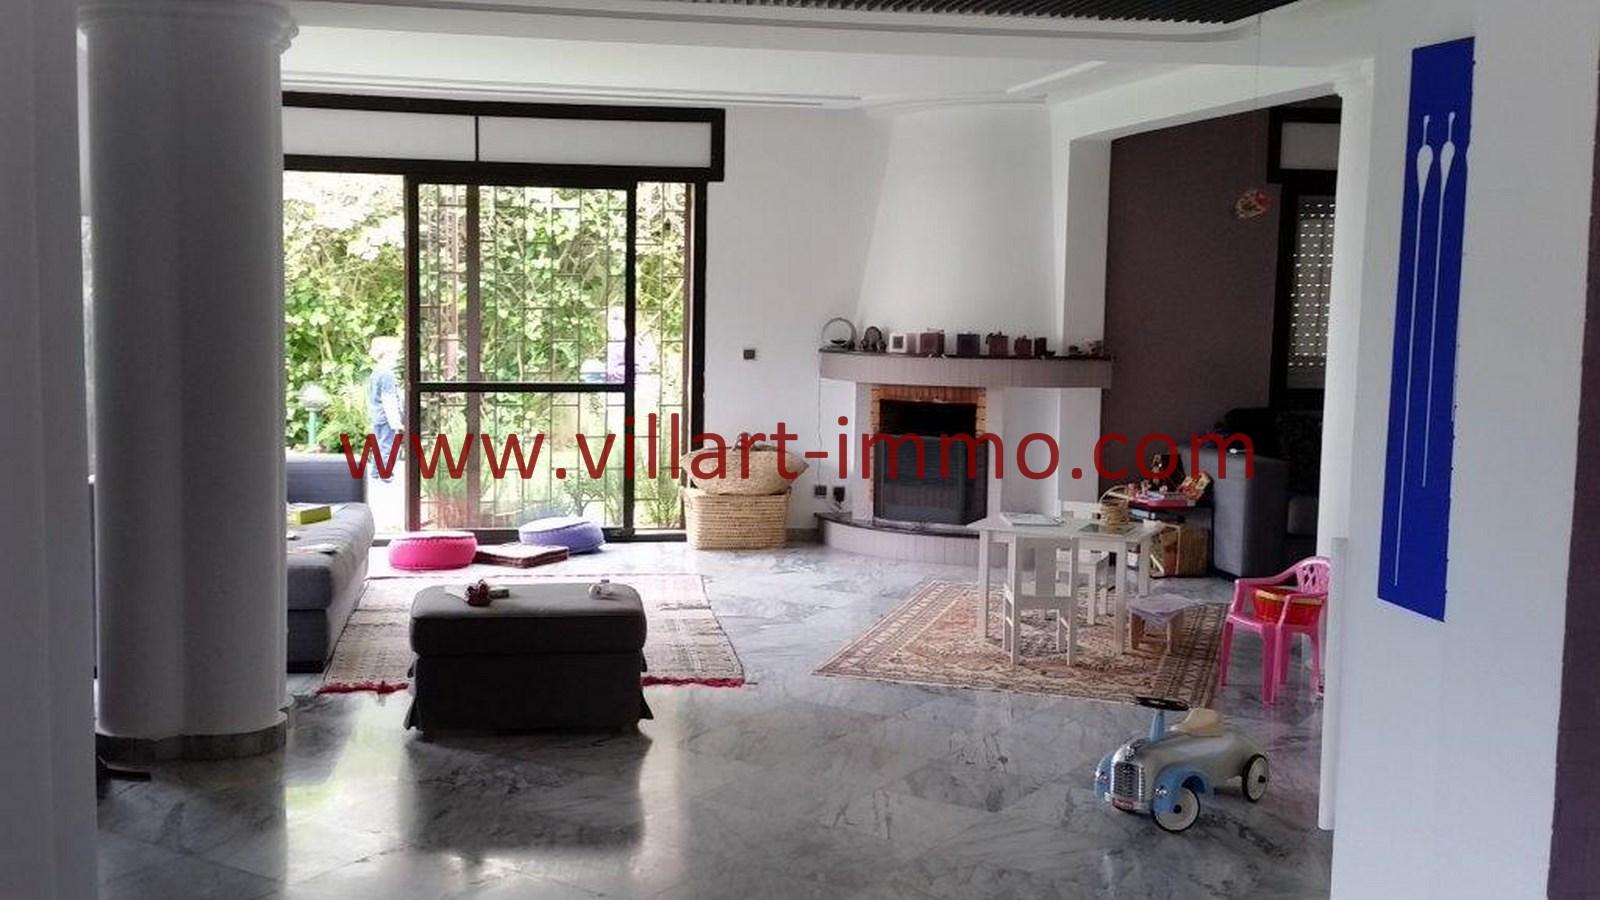 3-a-vendre-tanger-villa-californie-salon-1-vv459-villart-immo-agence-immobiliere